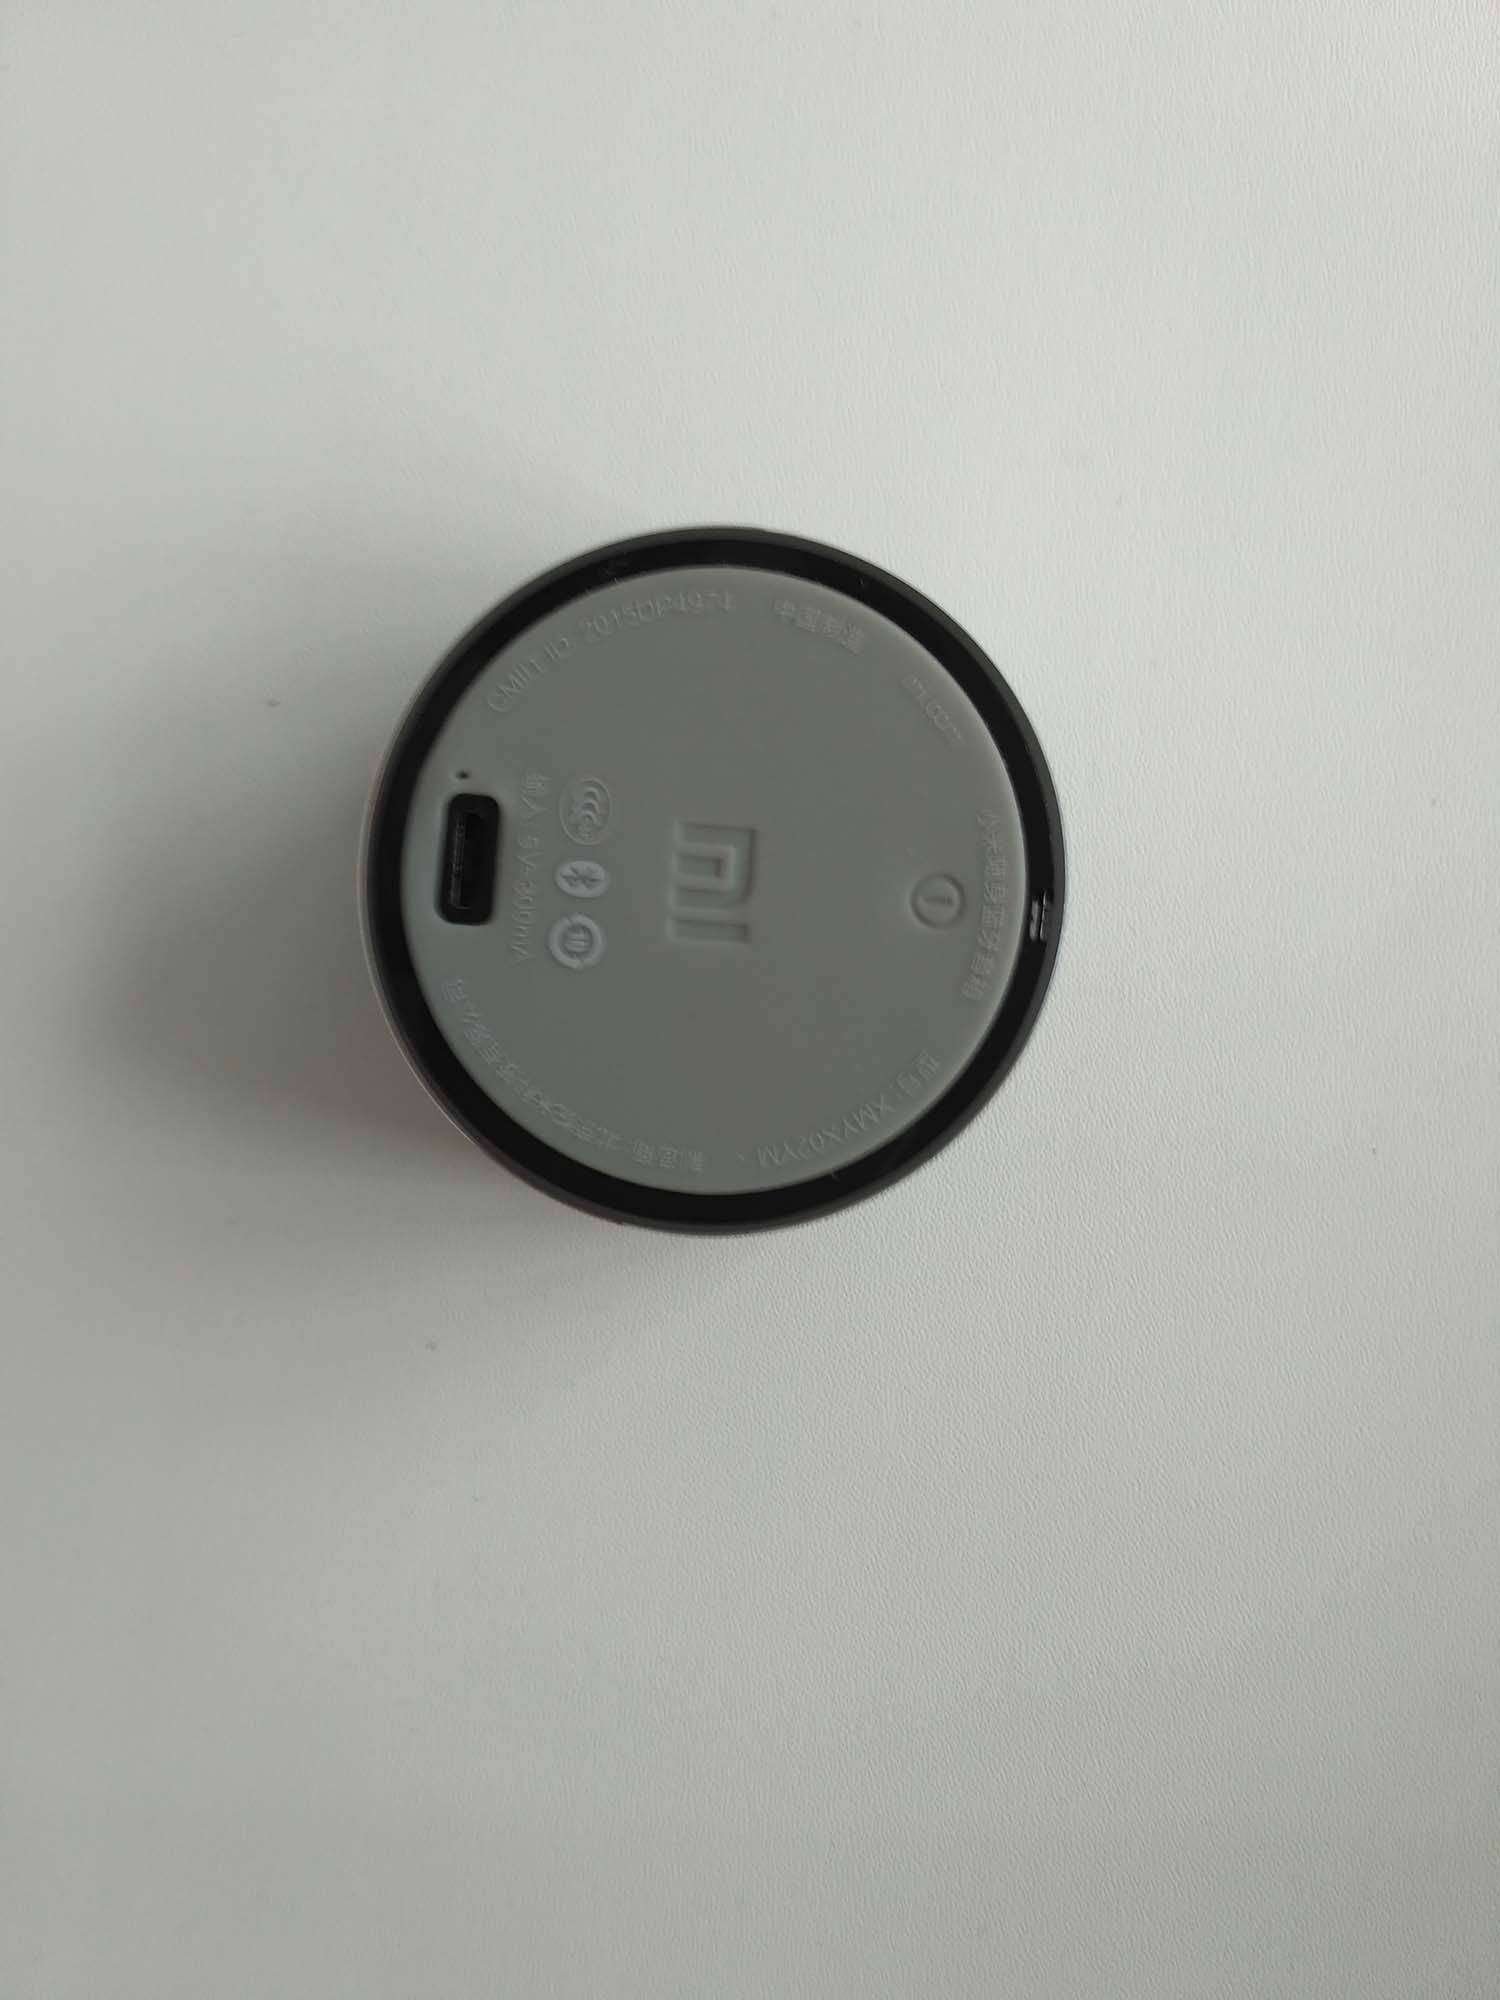 GearBest: Xiaomi Mi Bluetooth 4.0 Speaker